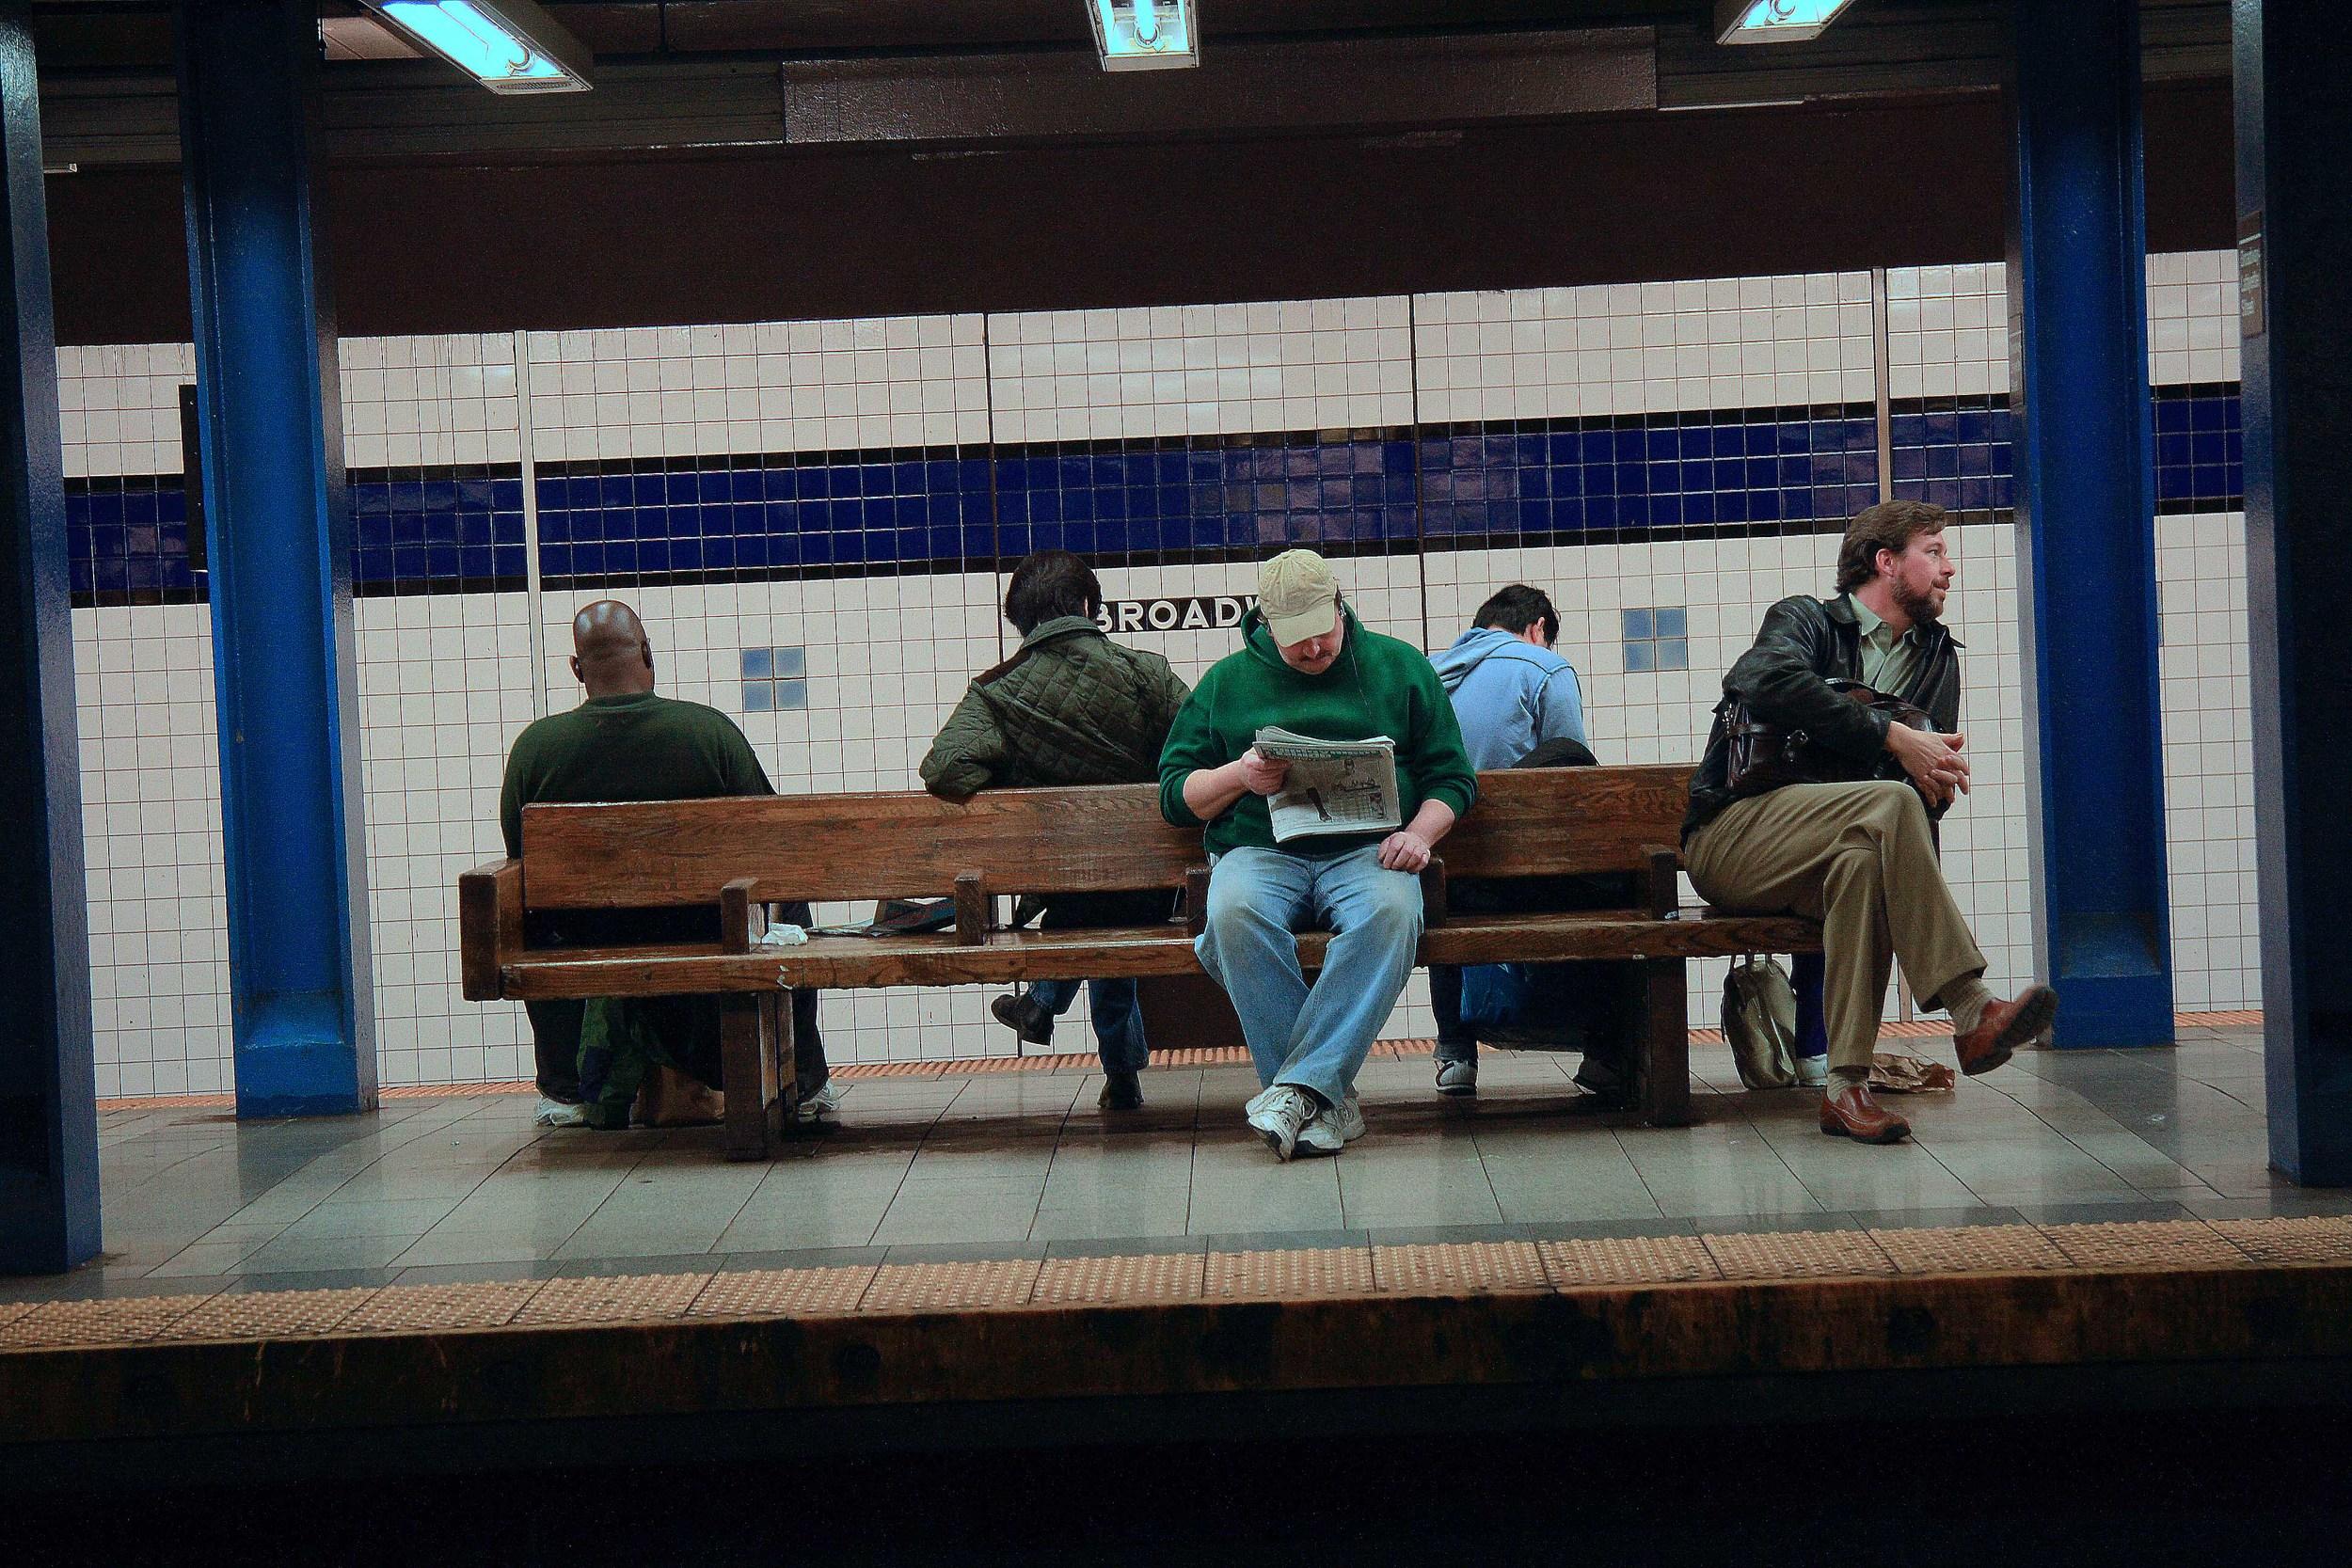 Broadway Subway NYC